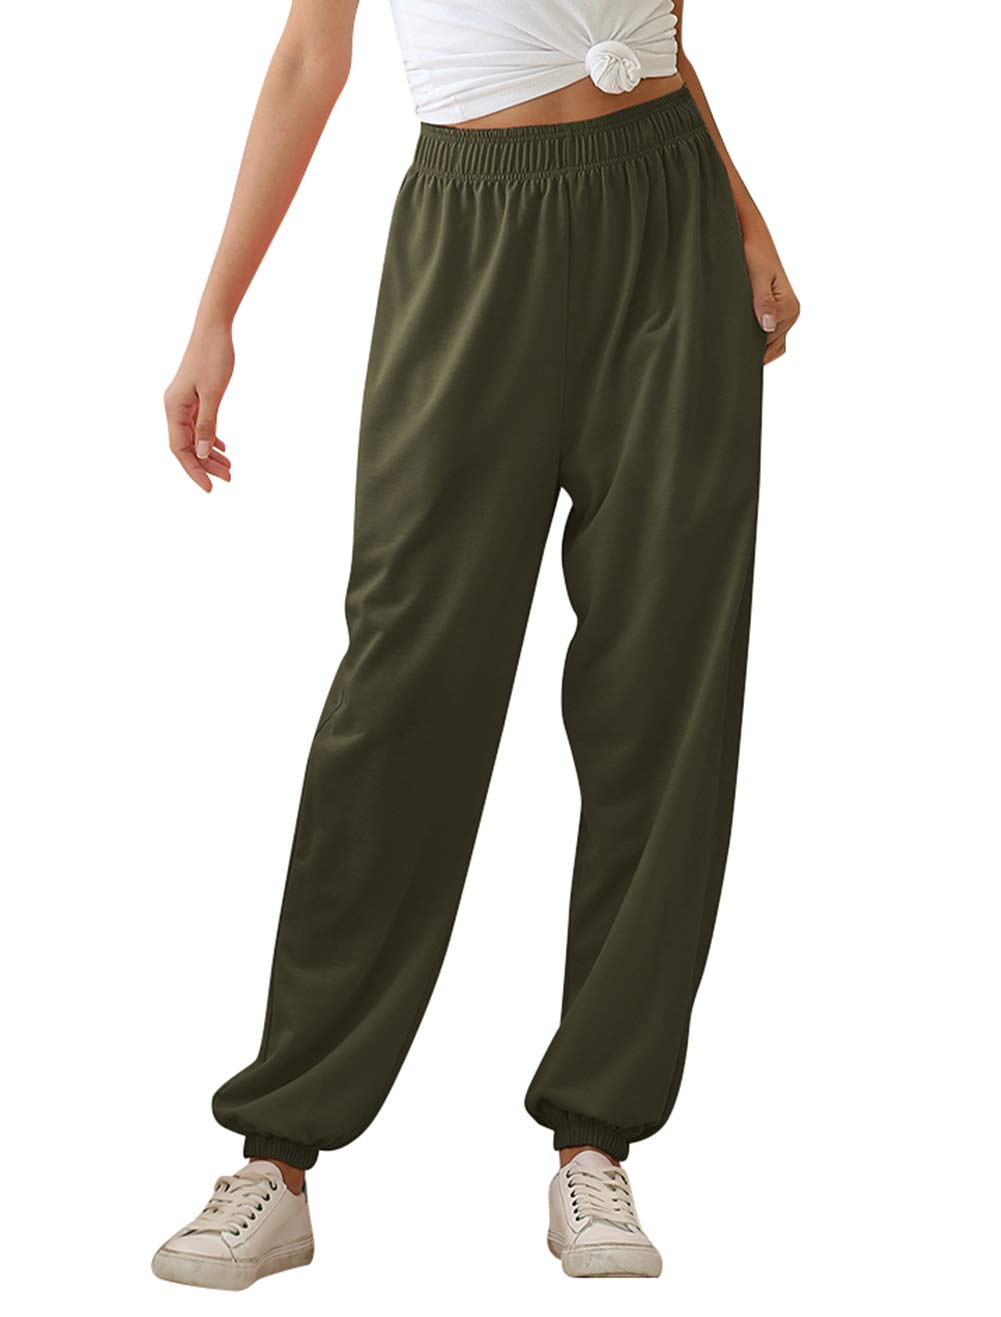 KEFITEVD Mens Lightweight Sweatpants Loose Fit Open Bottom Mesh Athletic Pants with Zipper Pockets